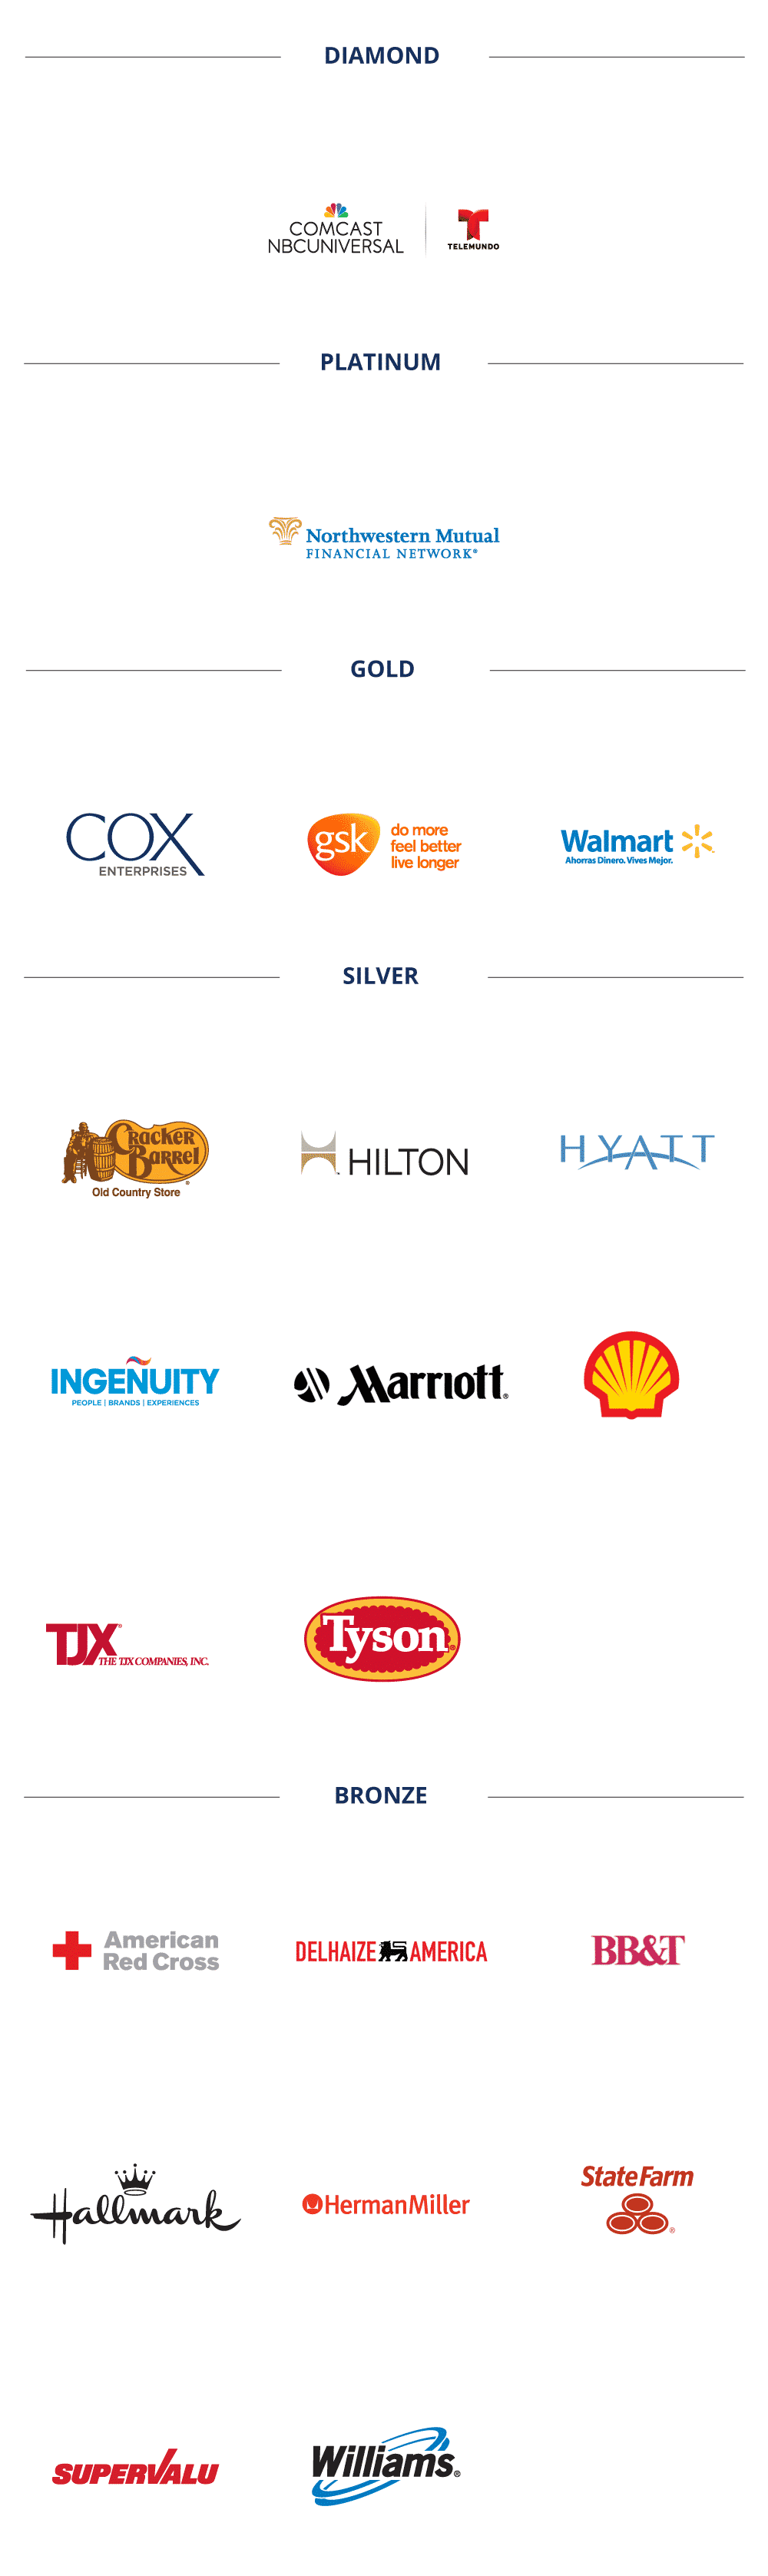 nhcc-sponsor_banner-3